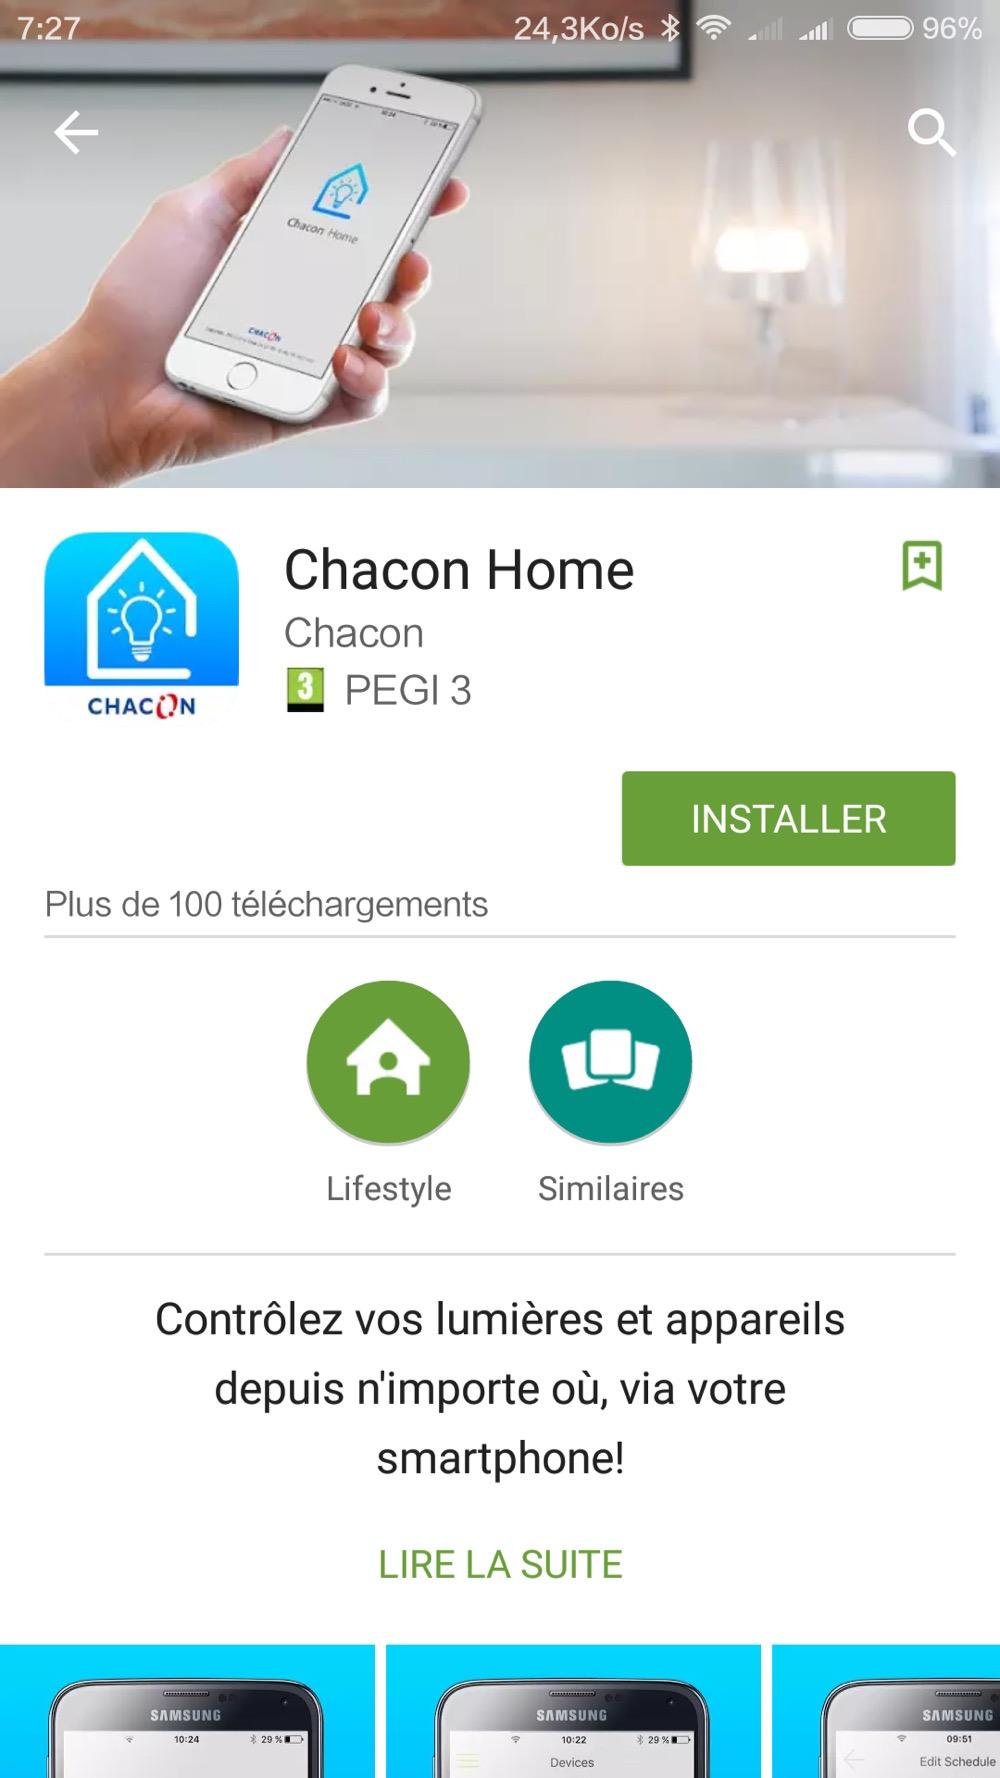 Screenshot_2016-08-15-07-27-56_com.android.vending